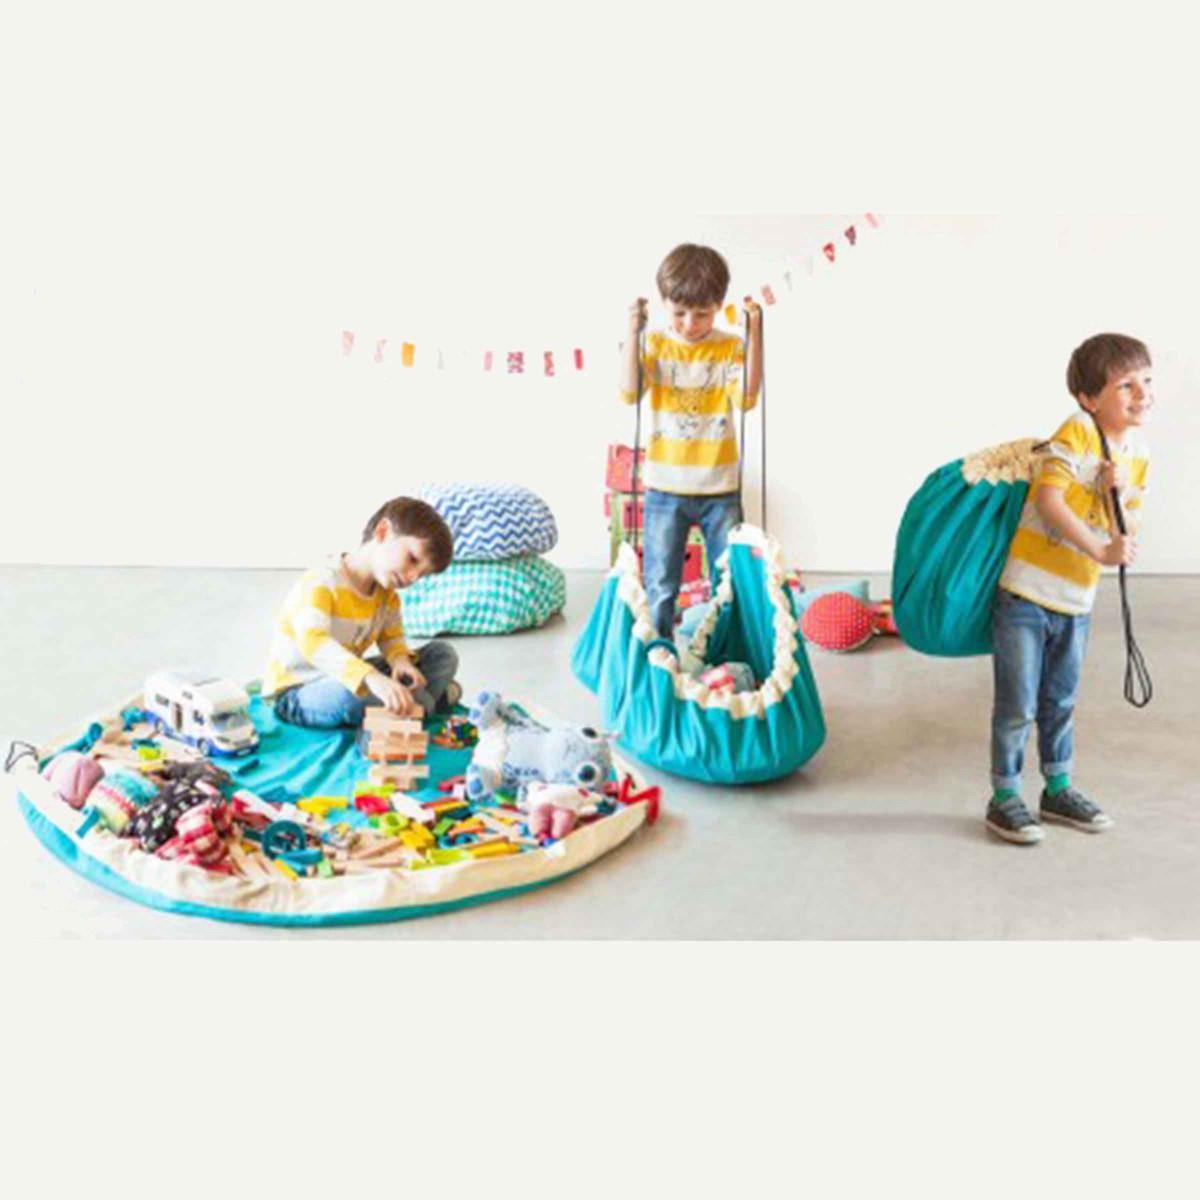 Tapis de jeu rangement jouets turquoise - Tapis enfant turquoise ...